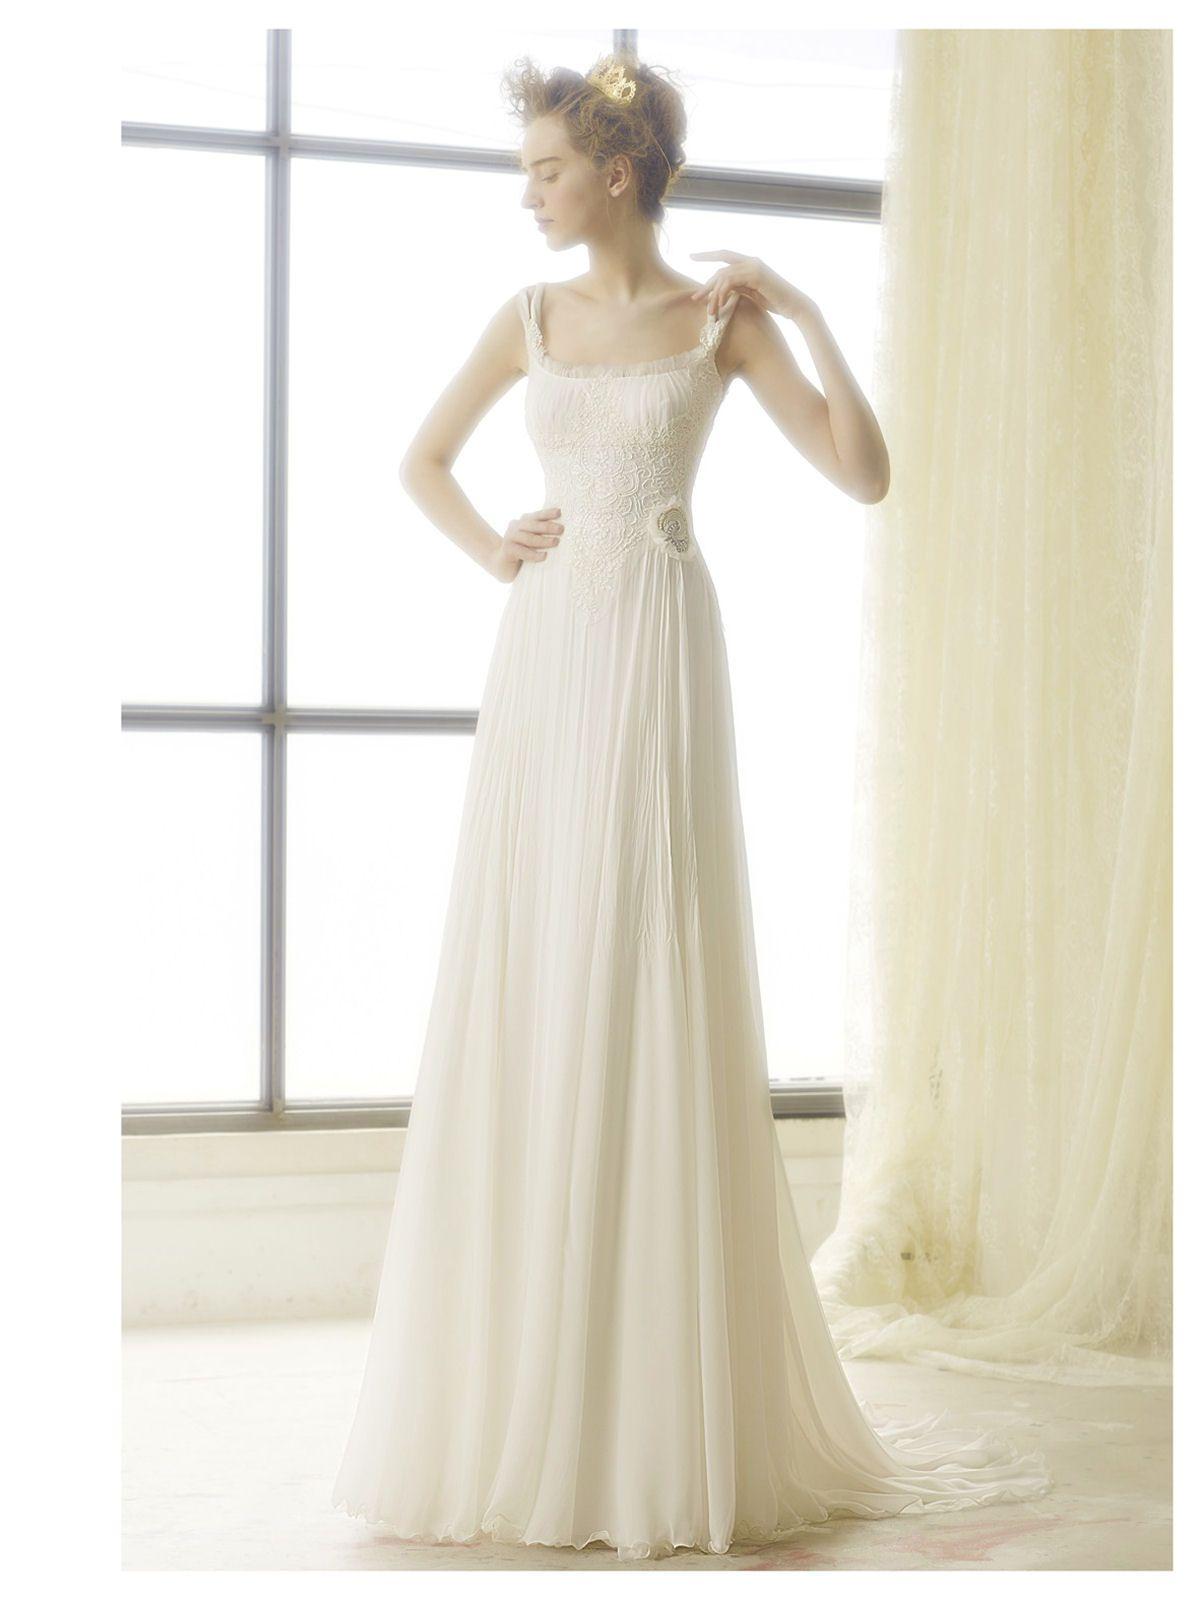 Ir Wedding Dresses